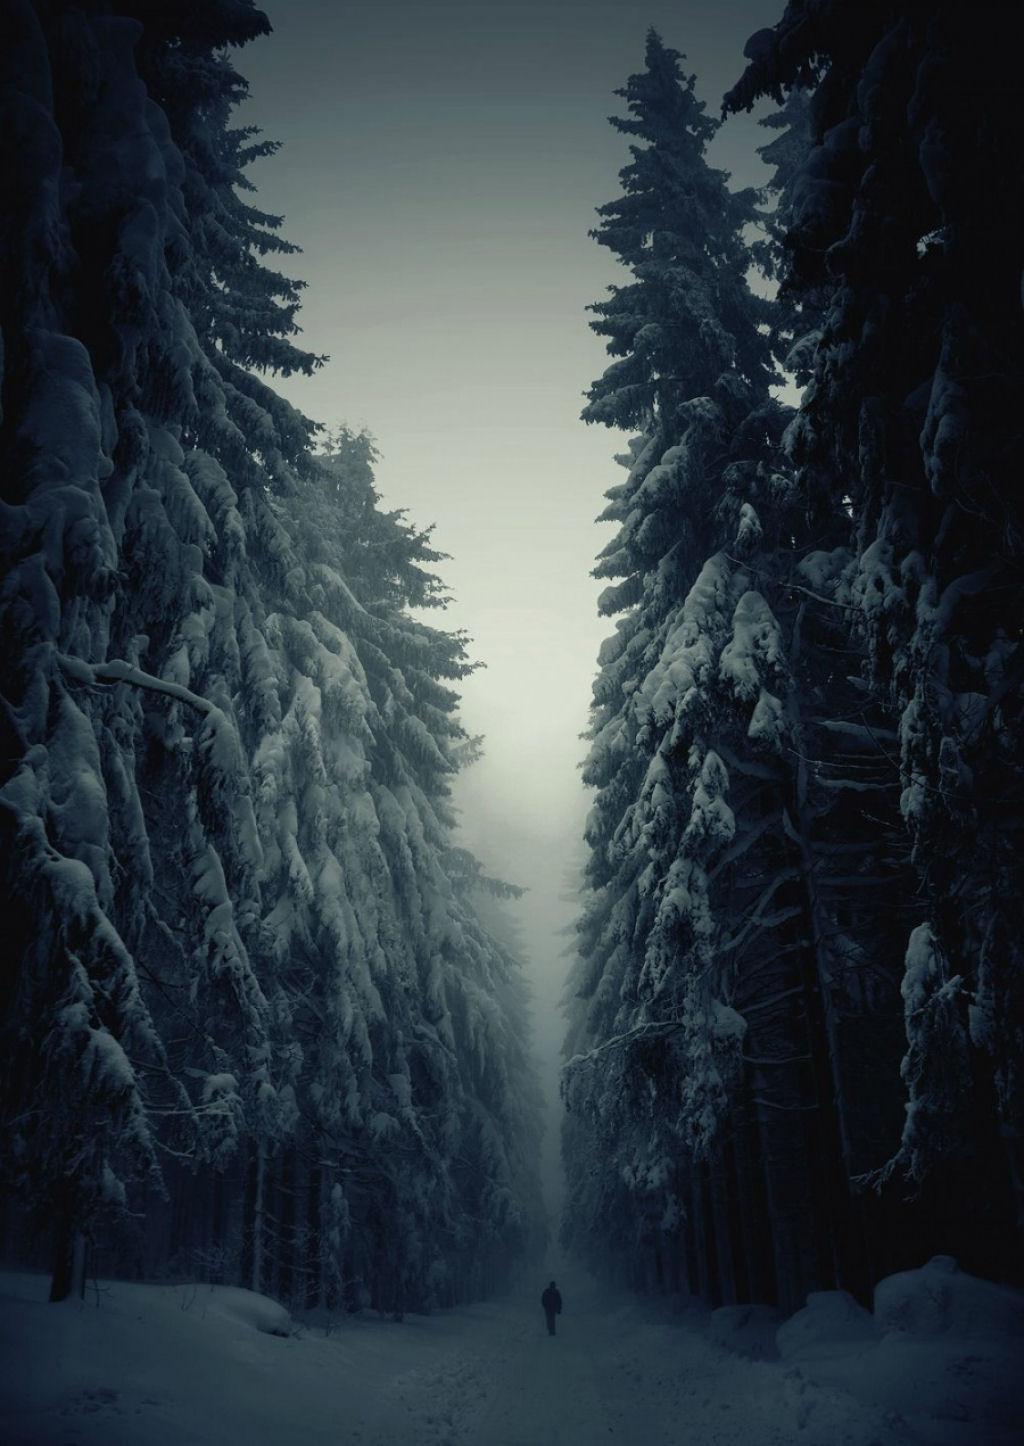 Fotos insignificancia del hombre ante la naturaleza 14